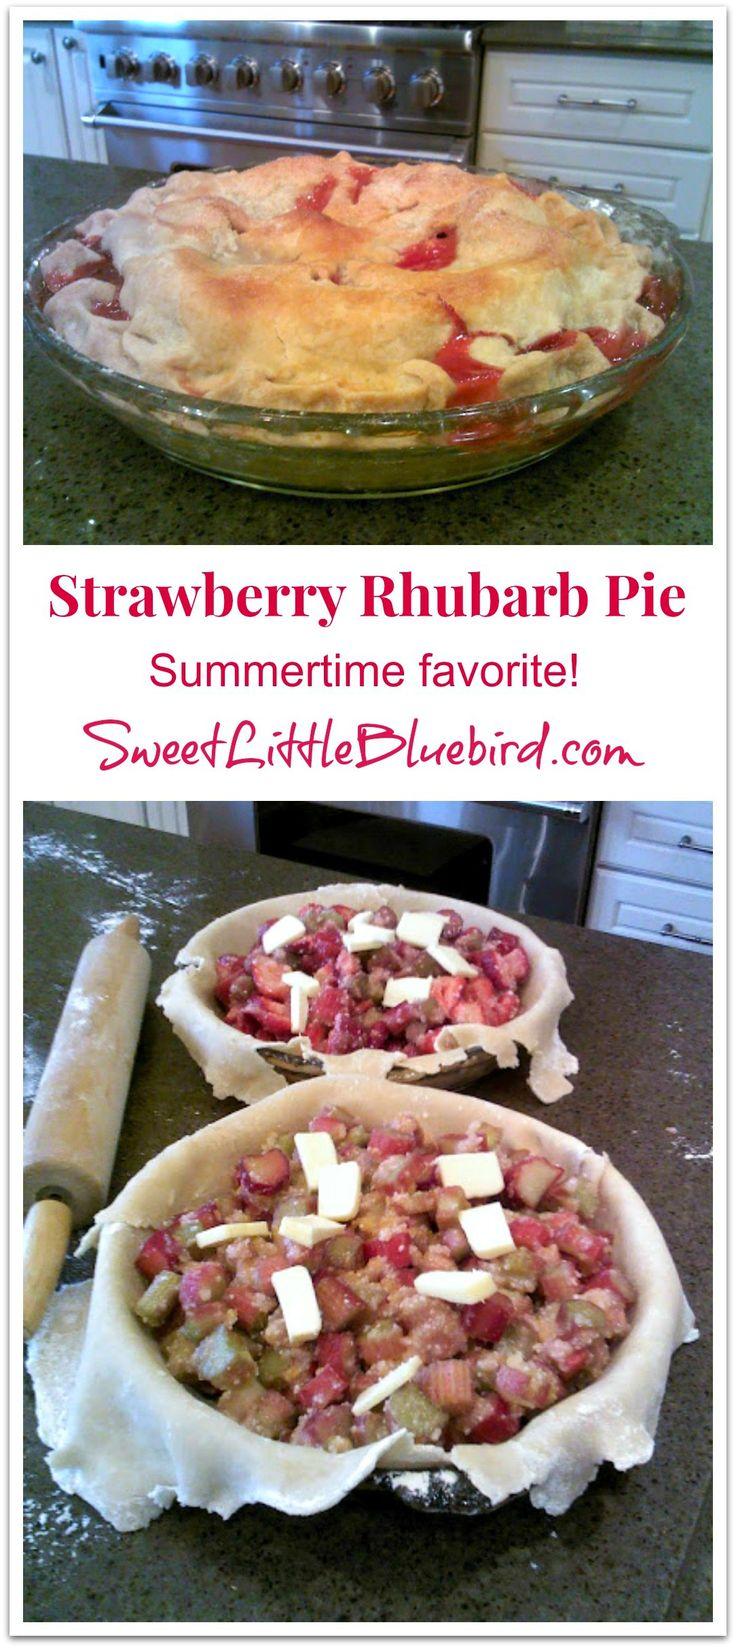 STRAWBERRY RHUBARB PIE - Made with grandma's pie crust recipe.  A classic summertime favorite!  |  SweetLittleBluebird.com